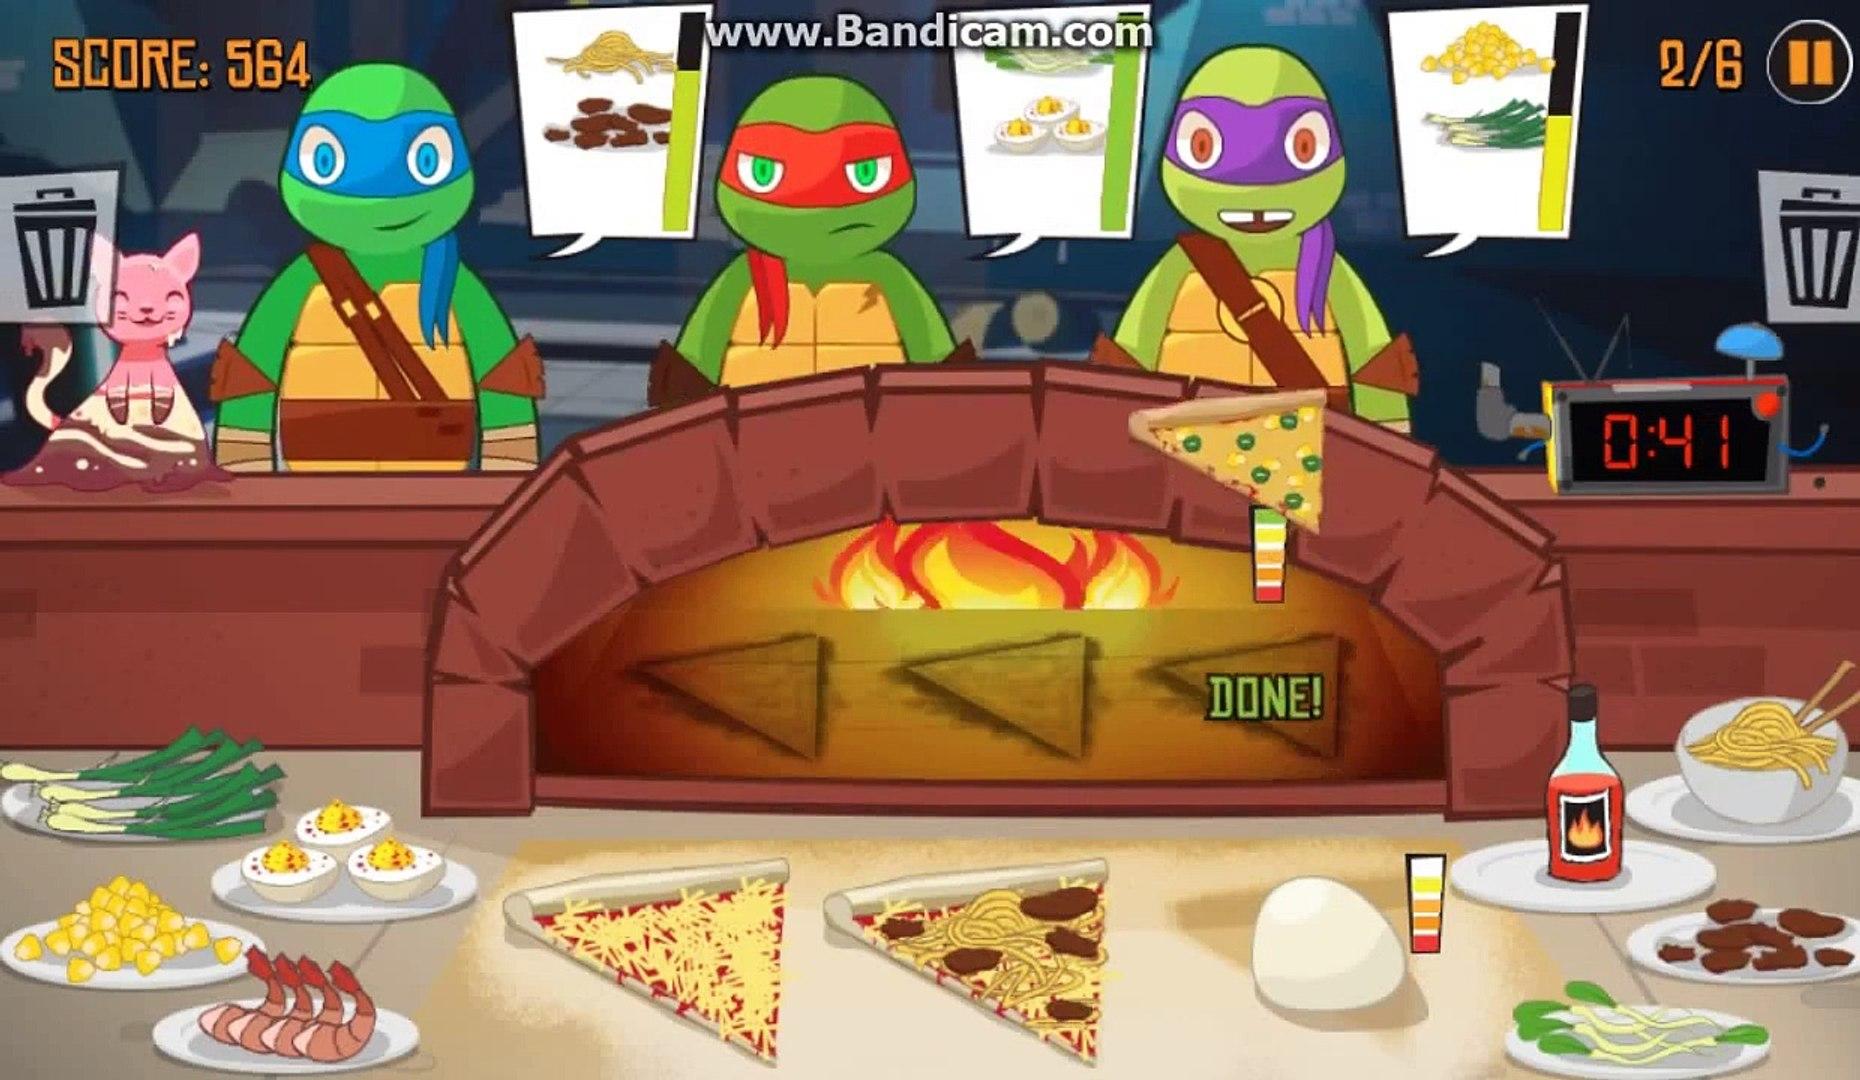 Черепашки Ниндзя. Игра для детей, готовим с ниндзя пицу.